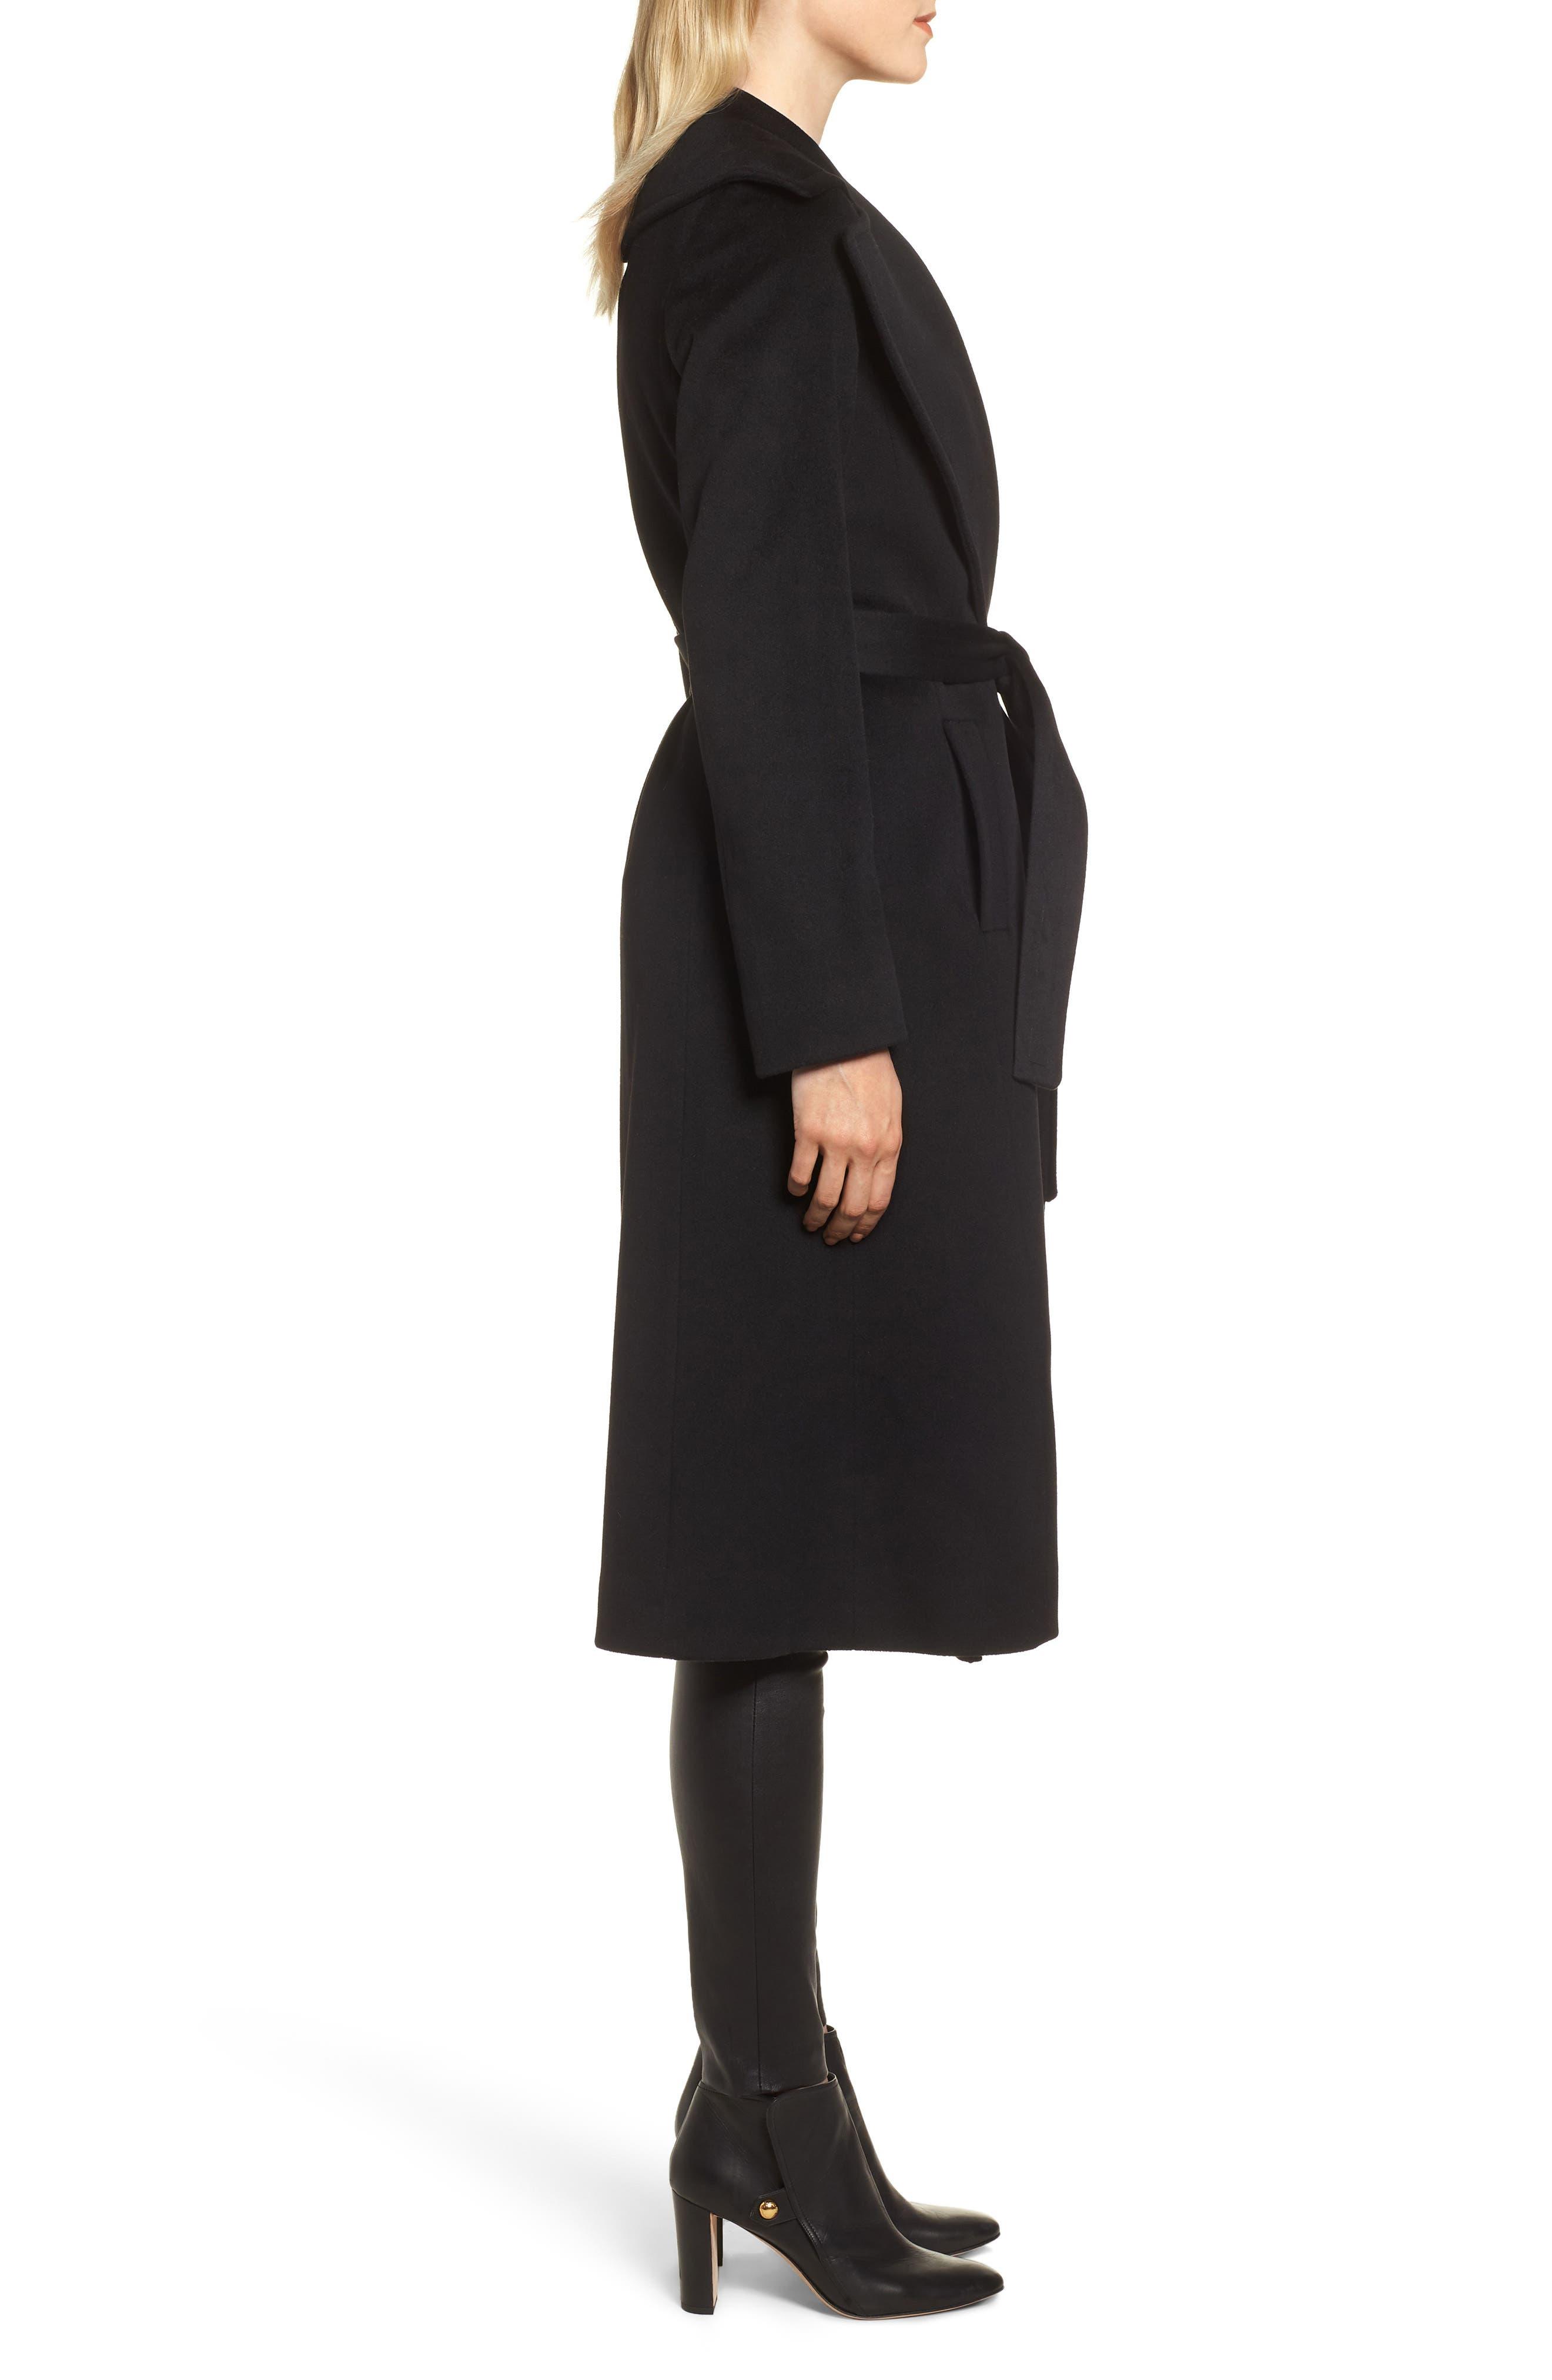 FLEURETTE, Loro Piana Wool Wrap Coat, Alternate thumbnail 4, color, 001